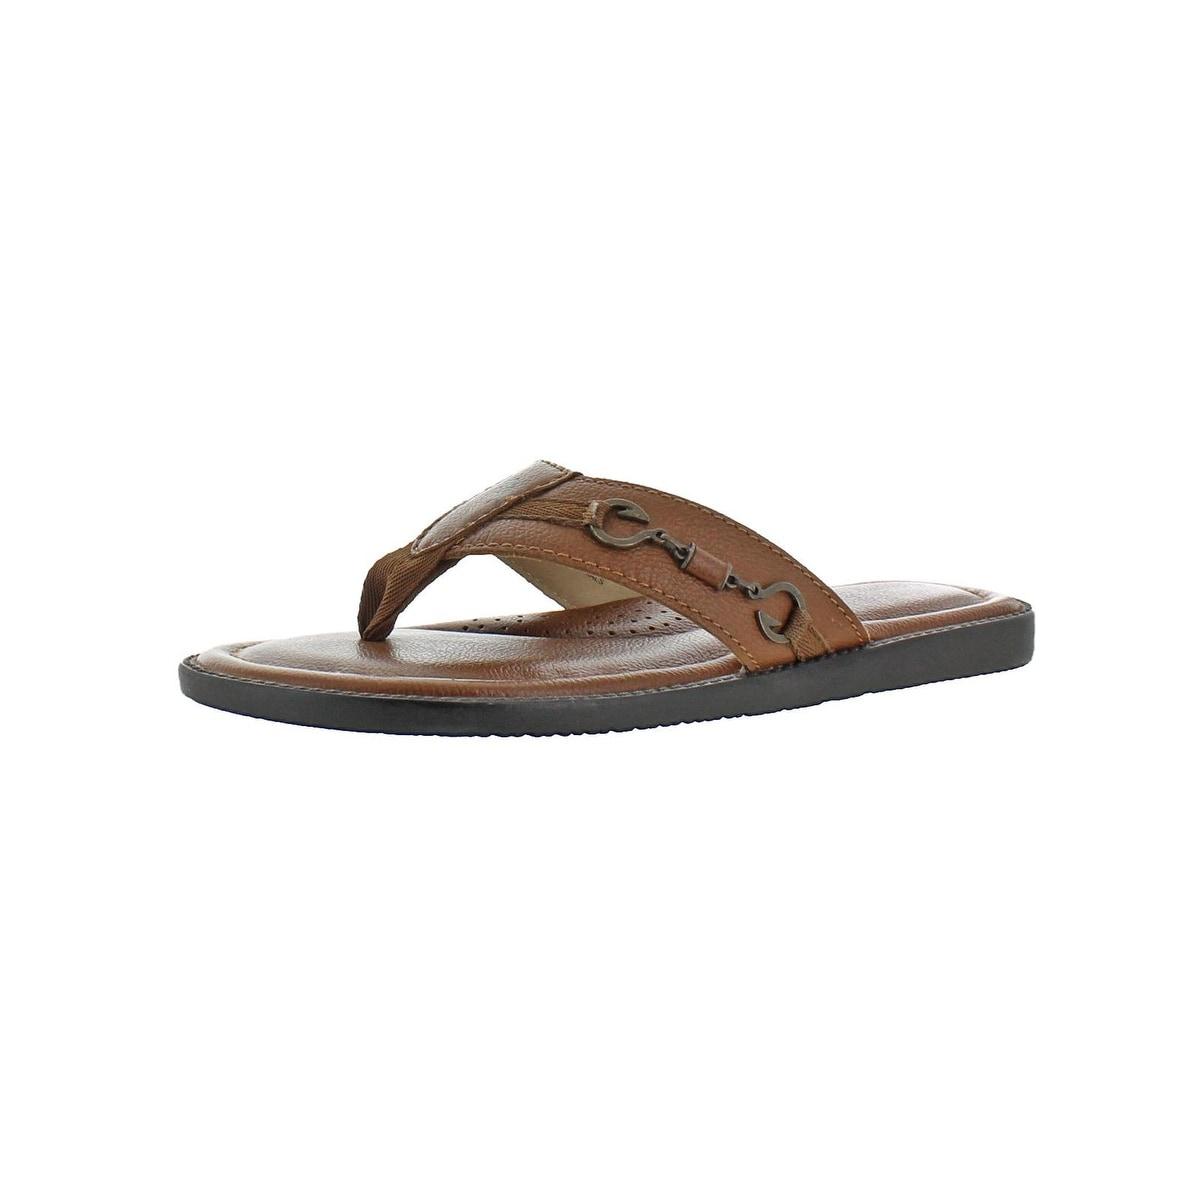 875e78299 Shop Tommy Bahama Mens Belazzio Flip-Flops Summer Thongs - 10 medium ...